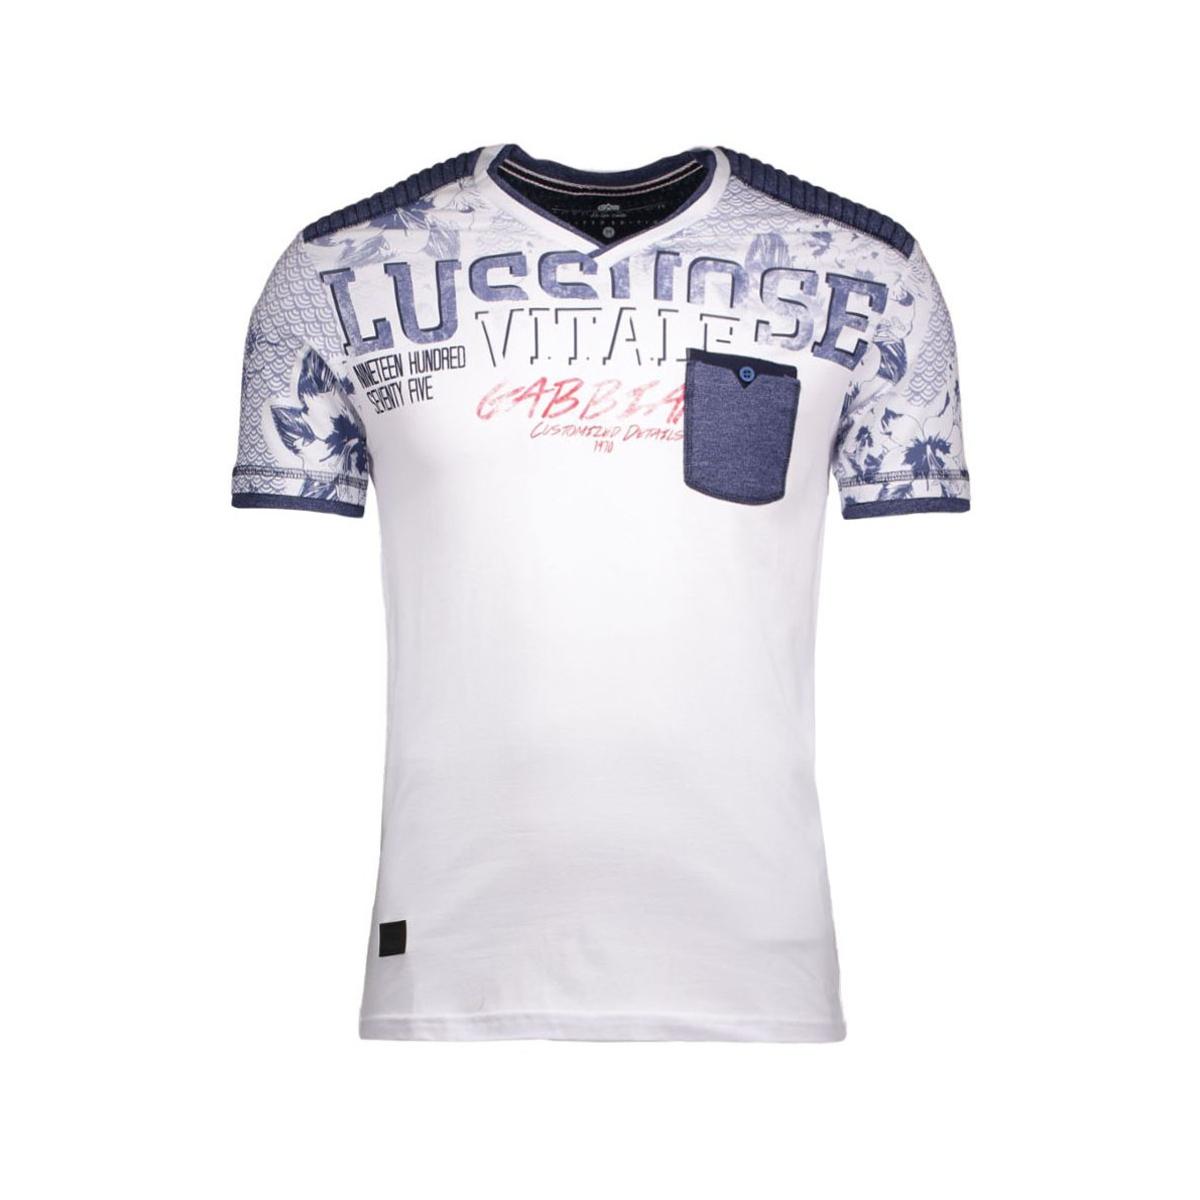 4997 gabbiano t-shirt wit